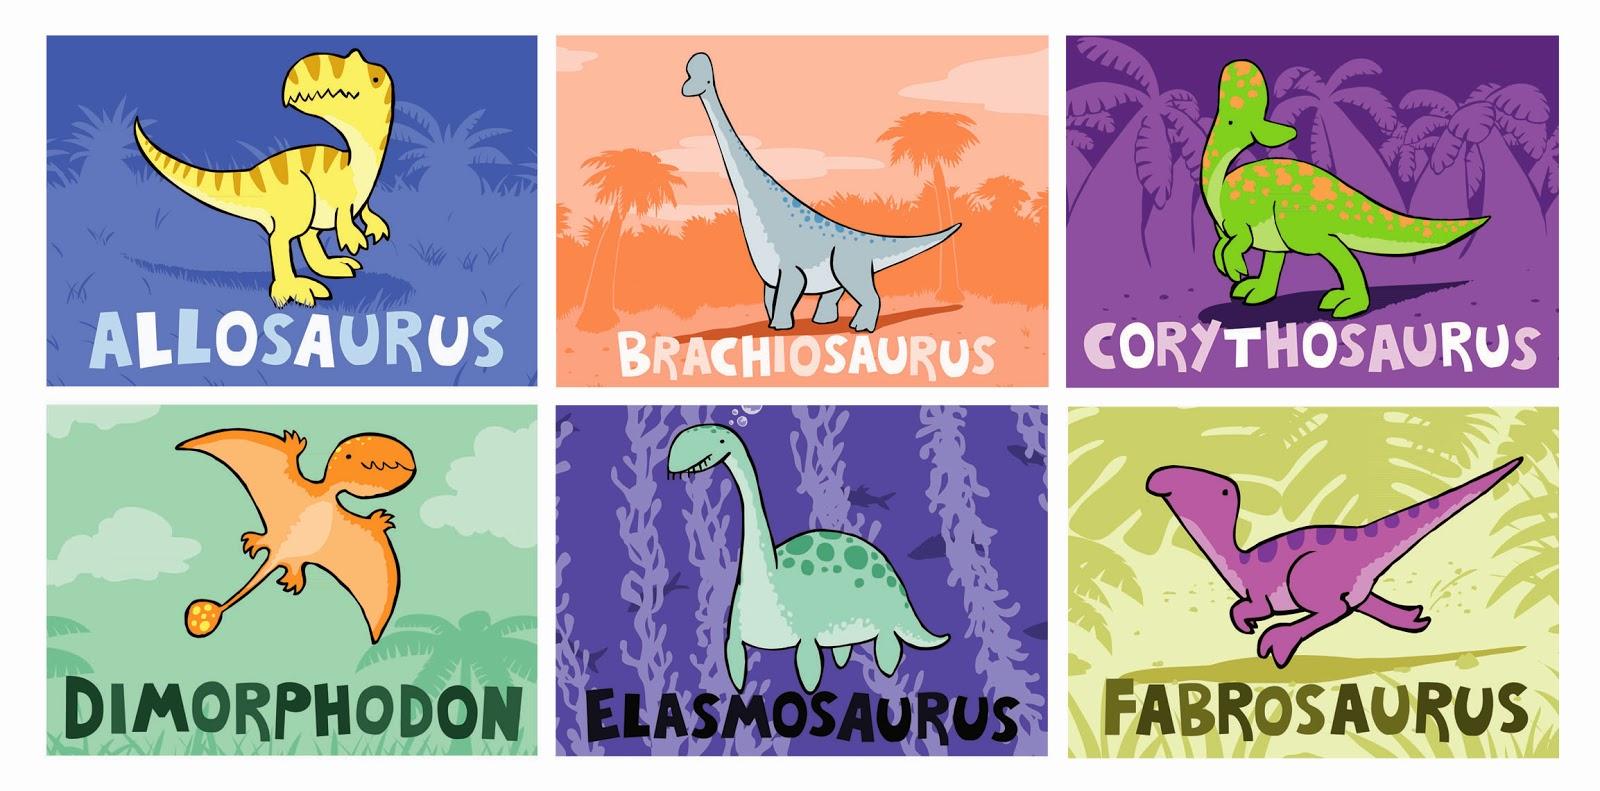 Allosaurus Brachiosaurus Corythosaurus Dimorphodon Elasmosaurus Fabrosaurus